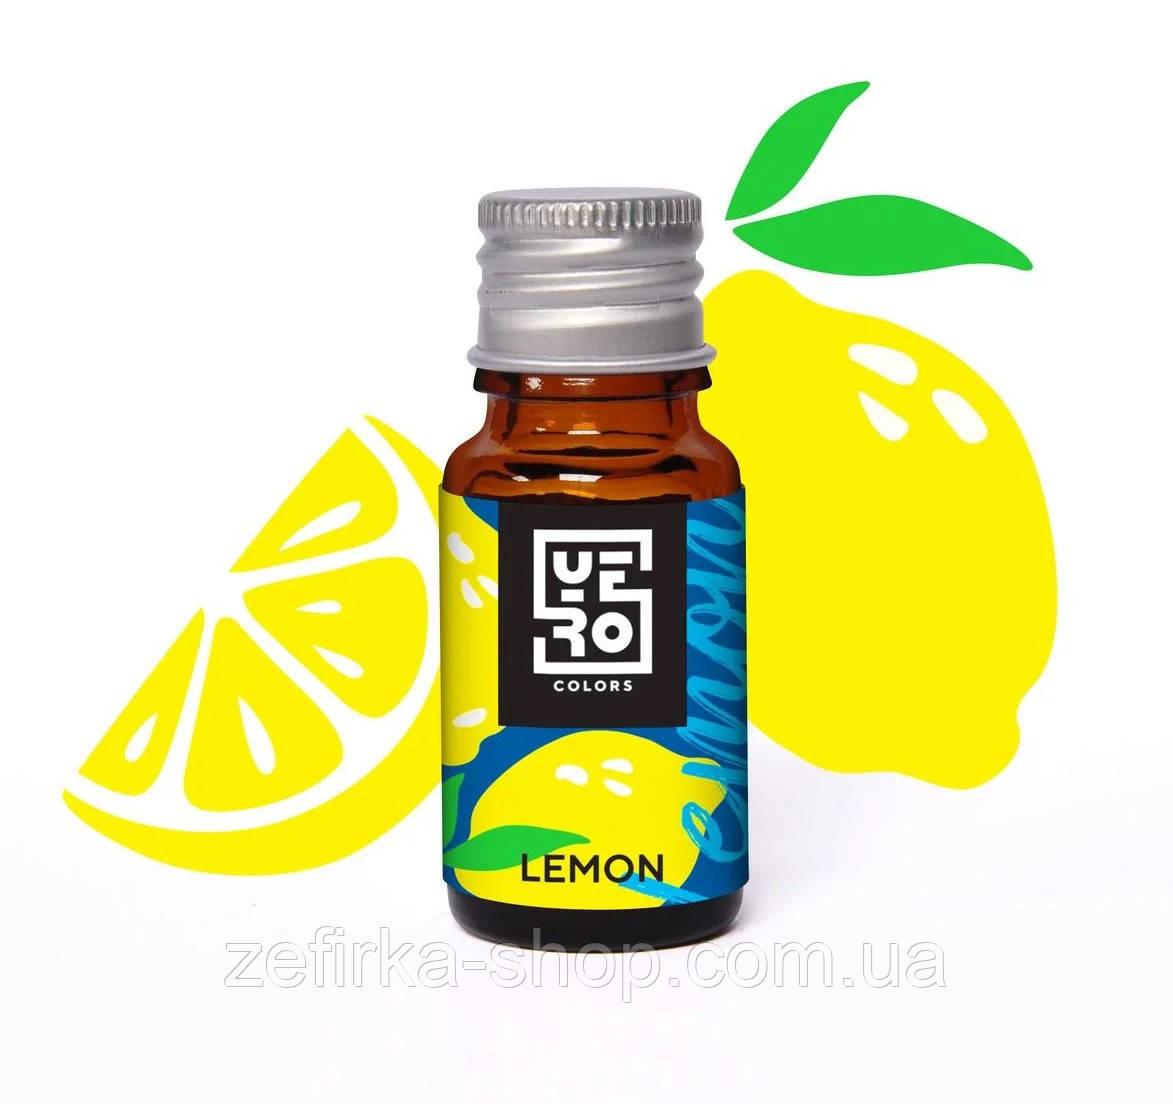 Ароматизатор Лимон Yero Colors, 10 грамм